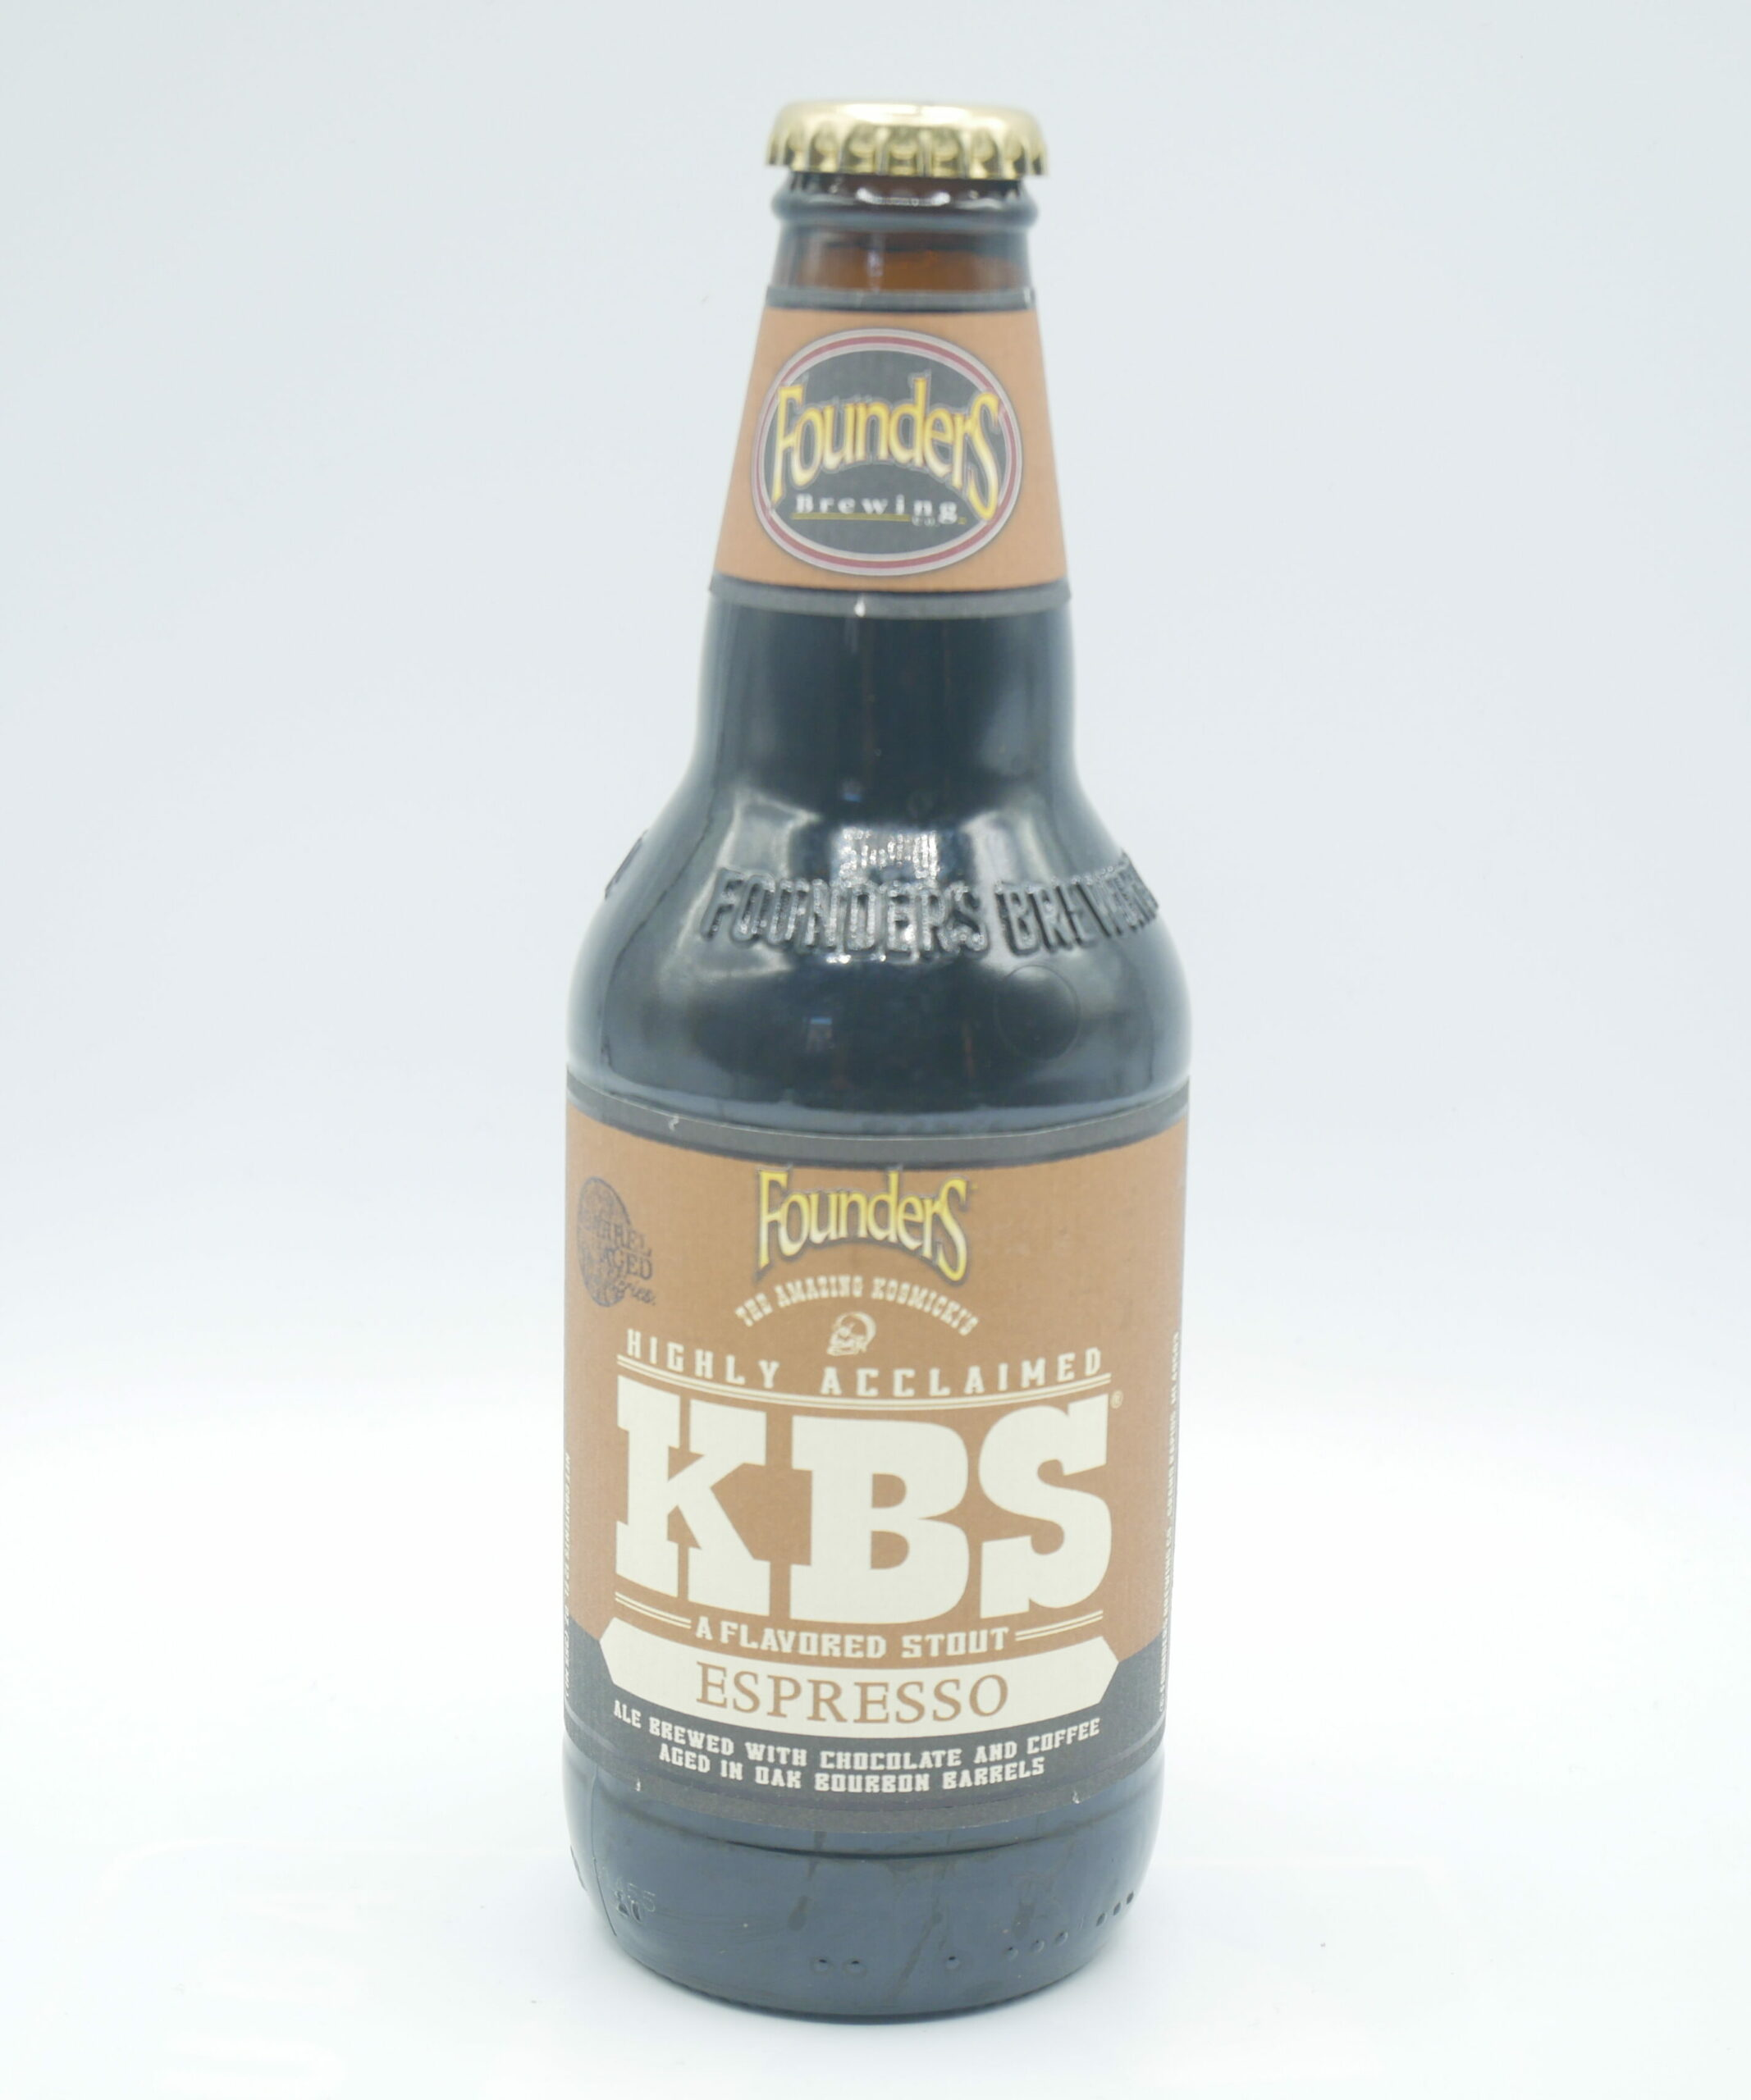 Image Kbs Espresso